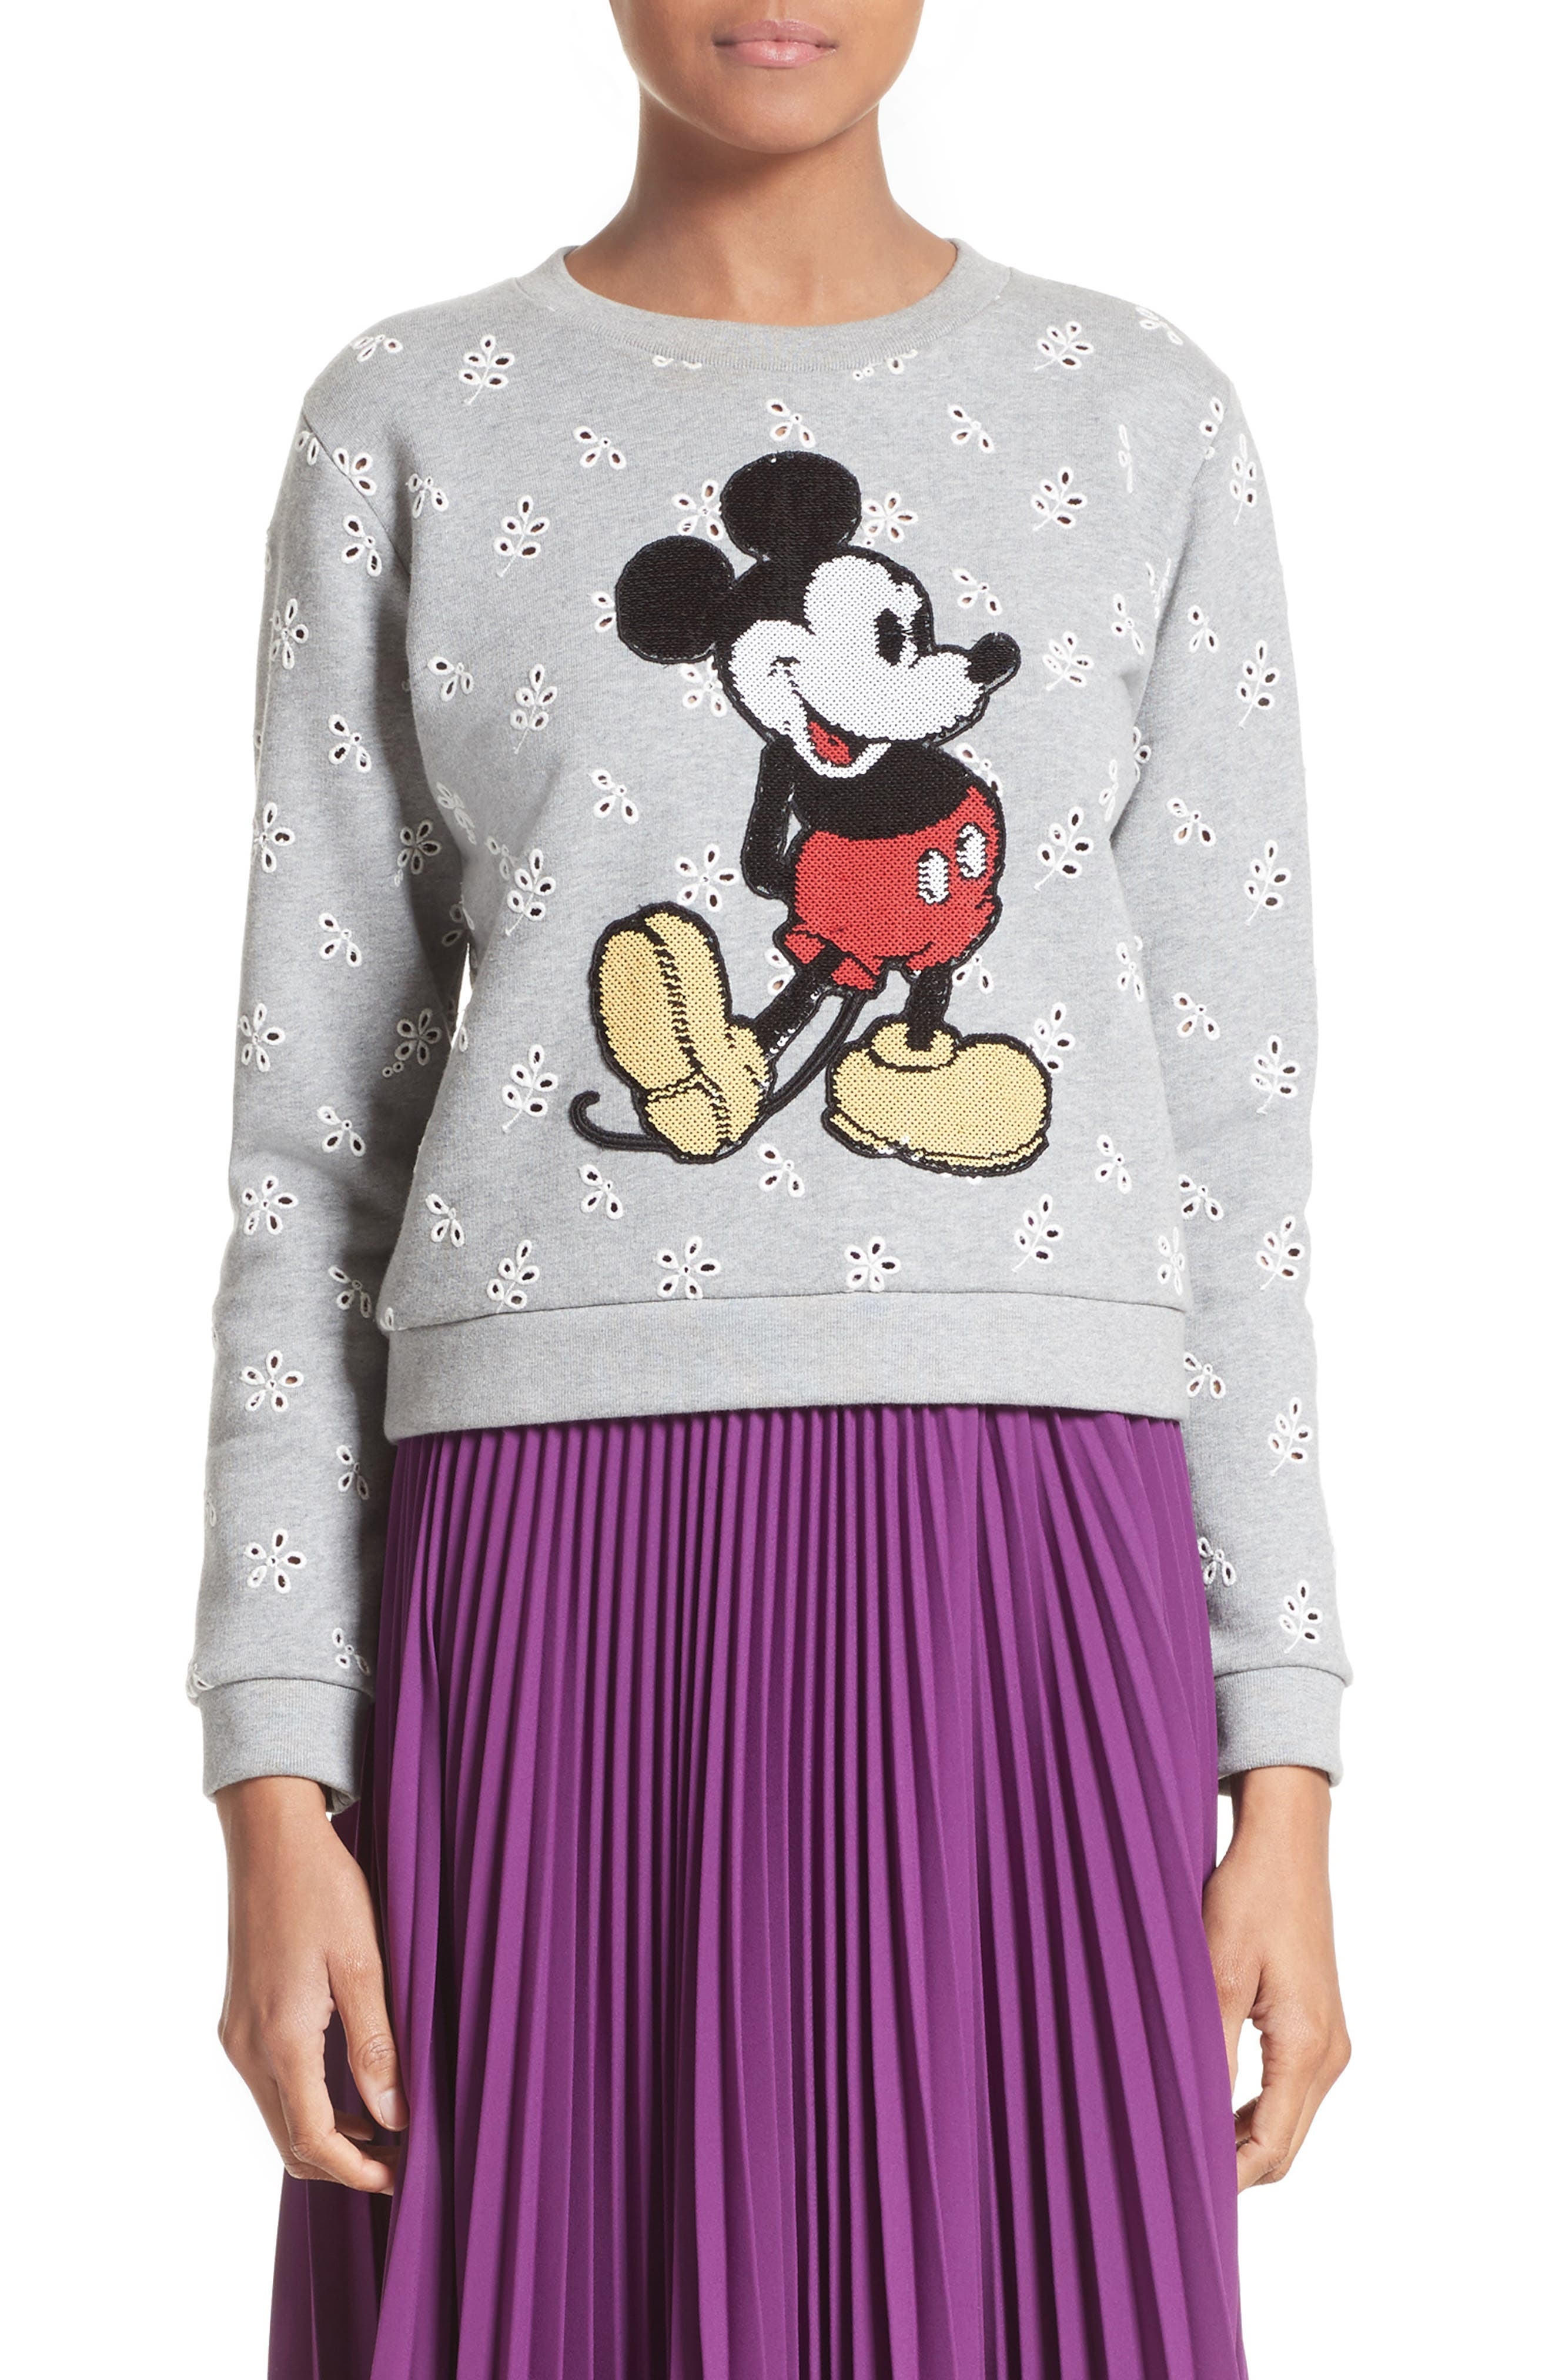 Alternate Image 1 Selected - MARC JACOBS Embellished Mickey Shrunken Sweatshirt